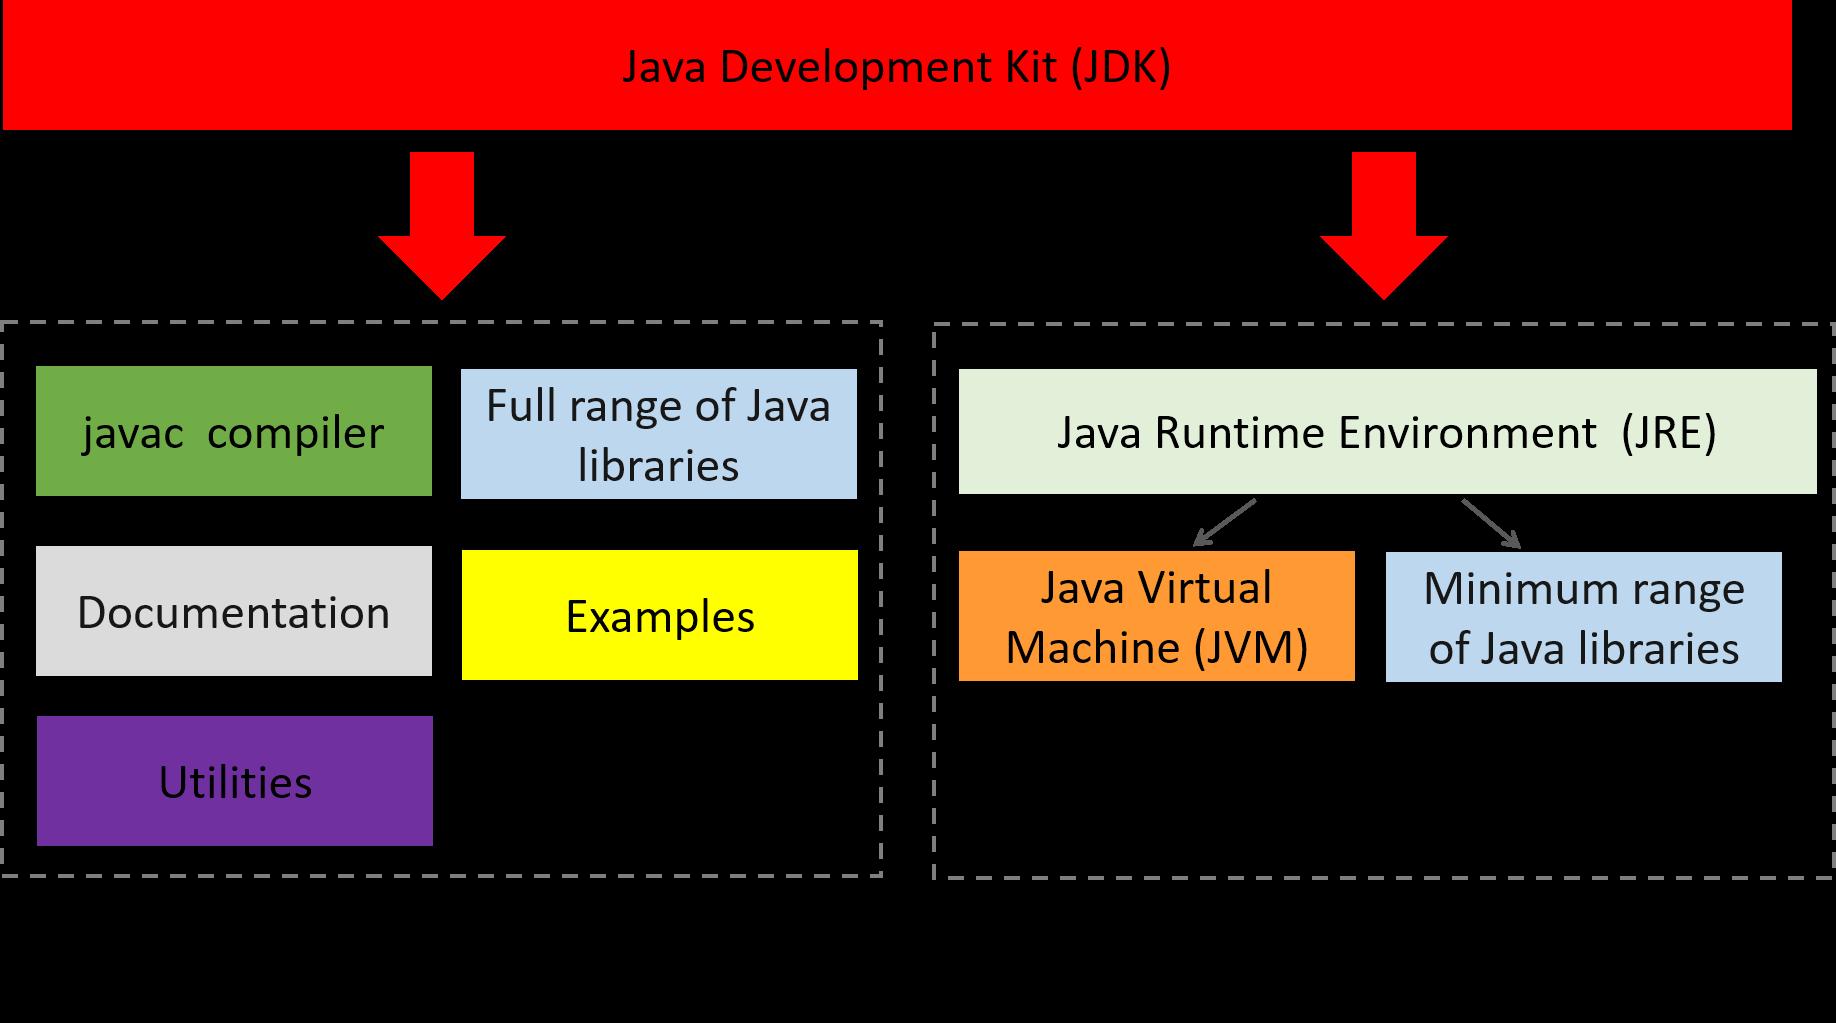 JDK-vertex-academy